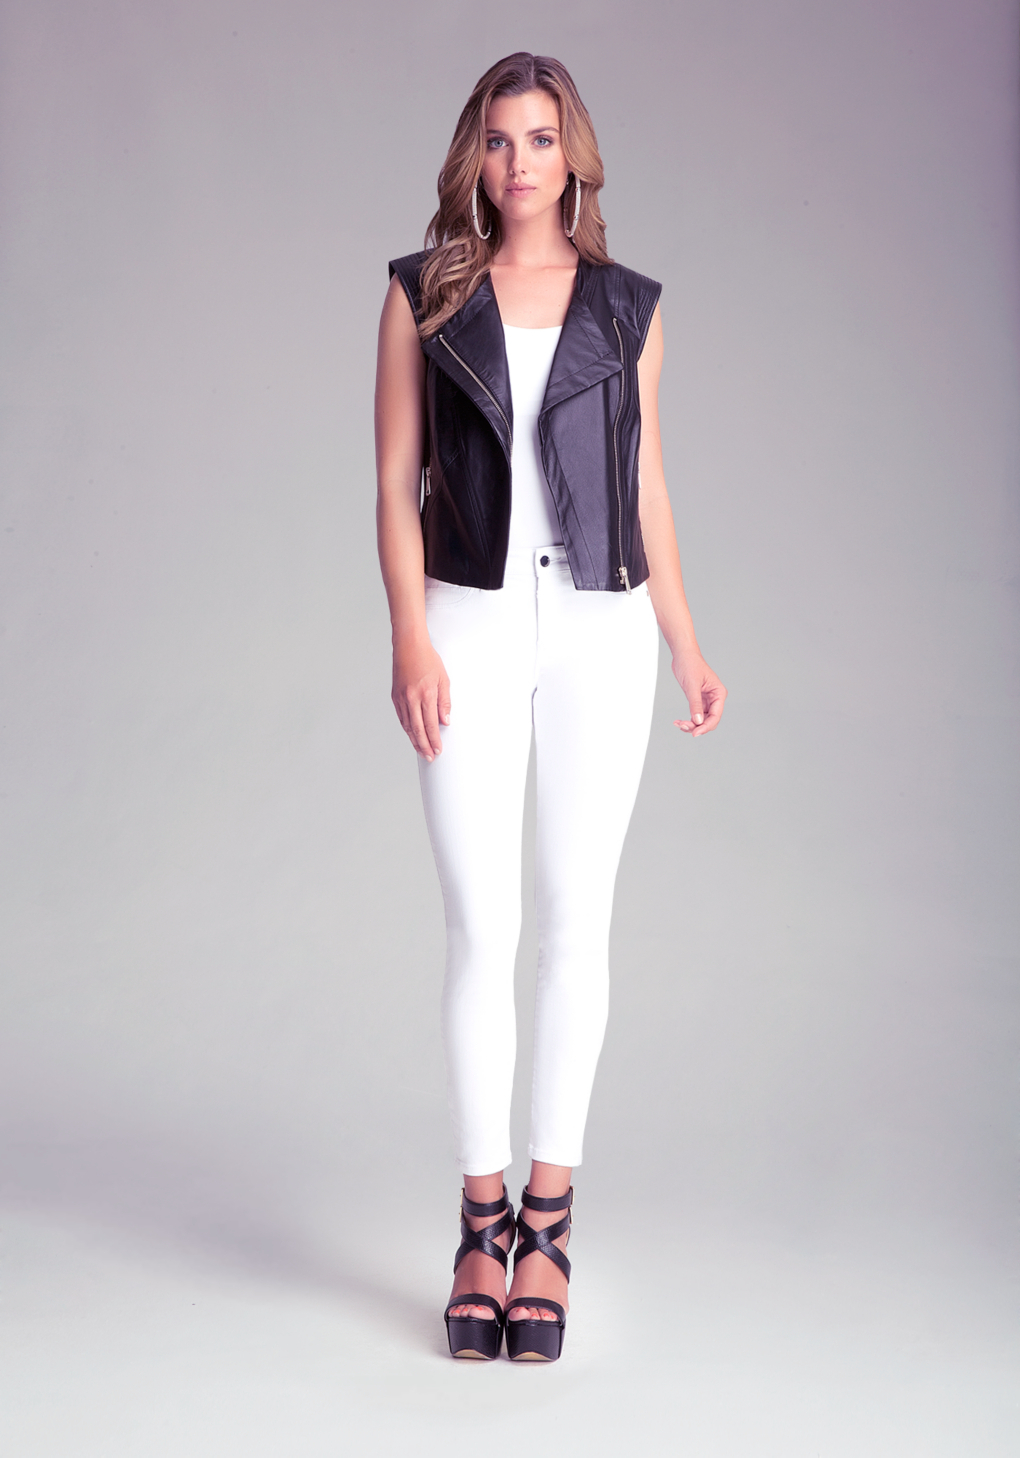 a14fb96174 Bebe Christina Leather Vest in Black - Lyst